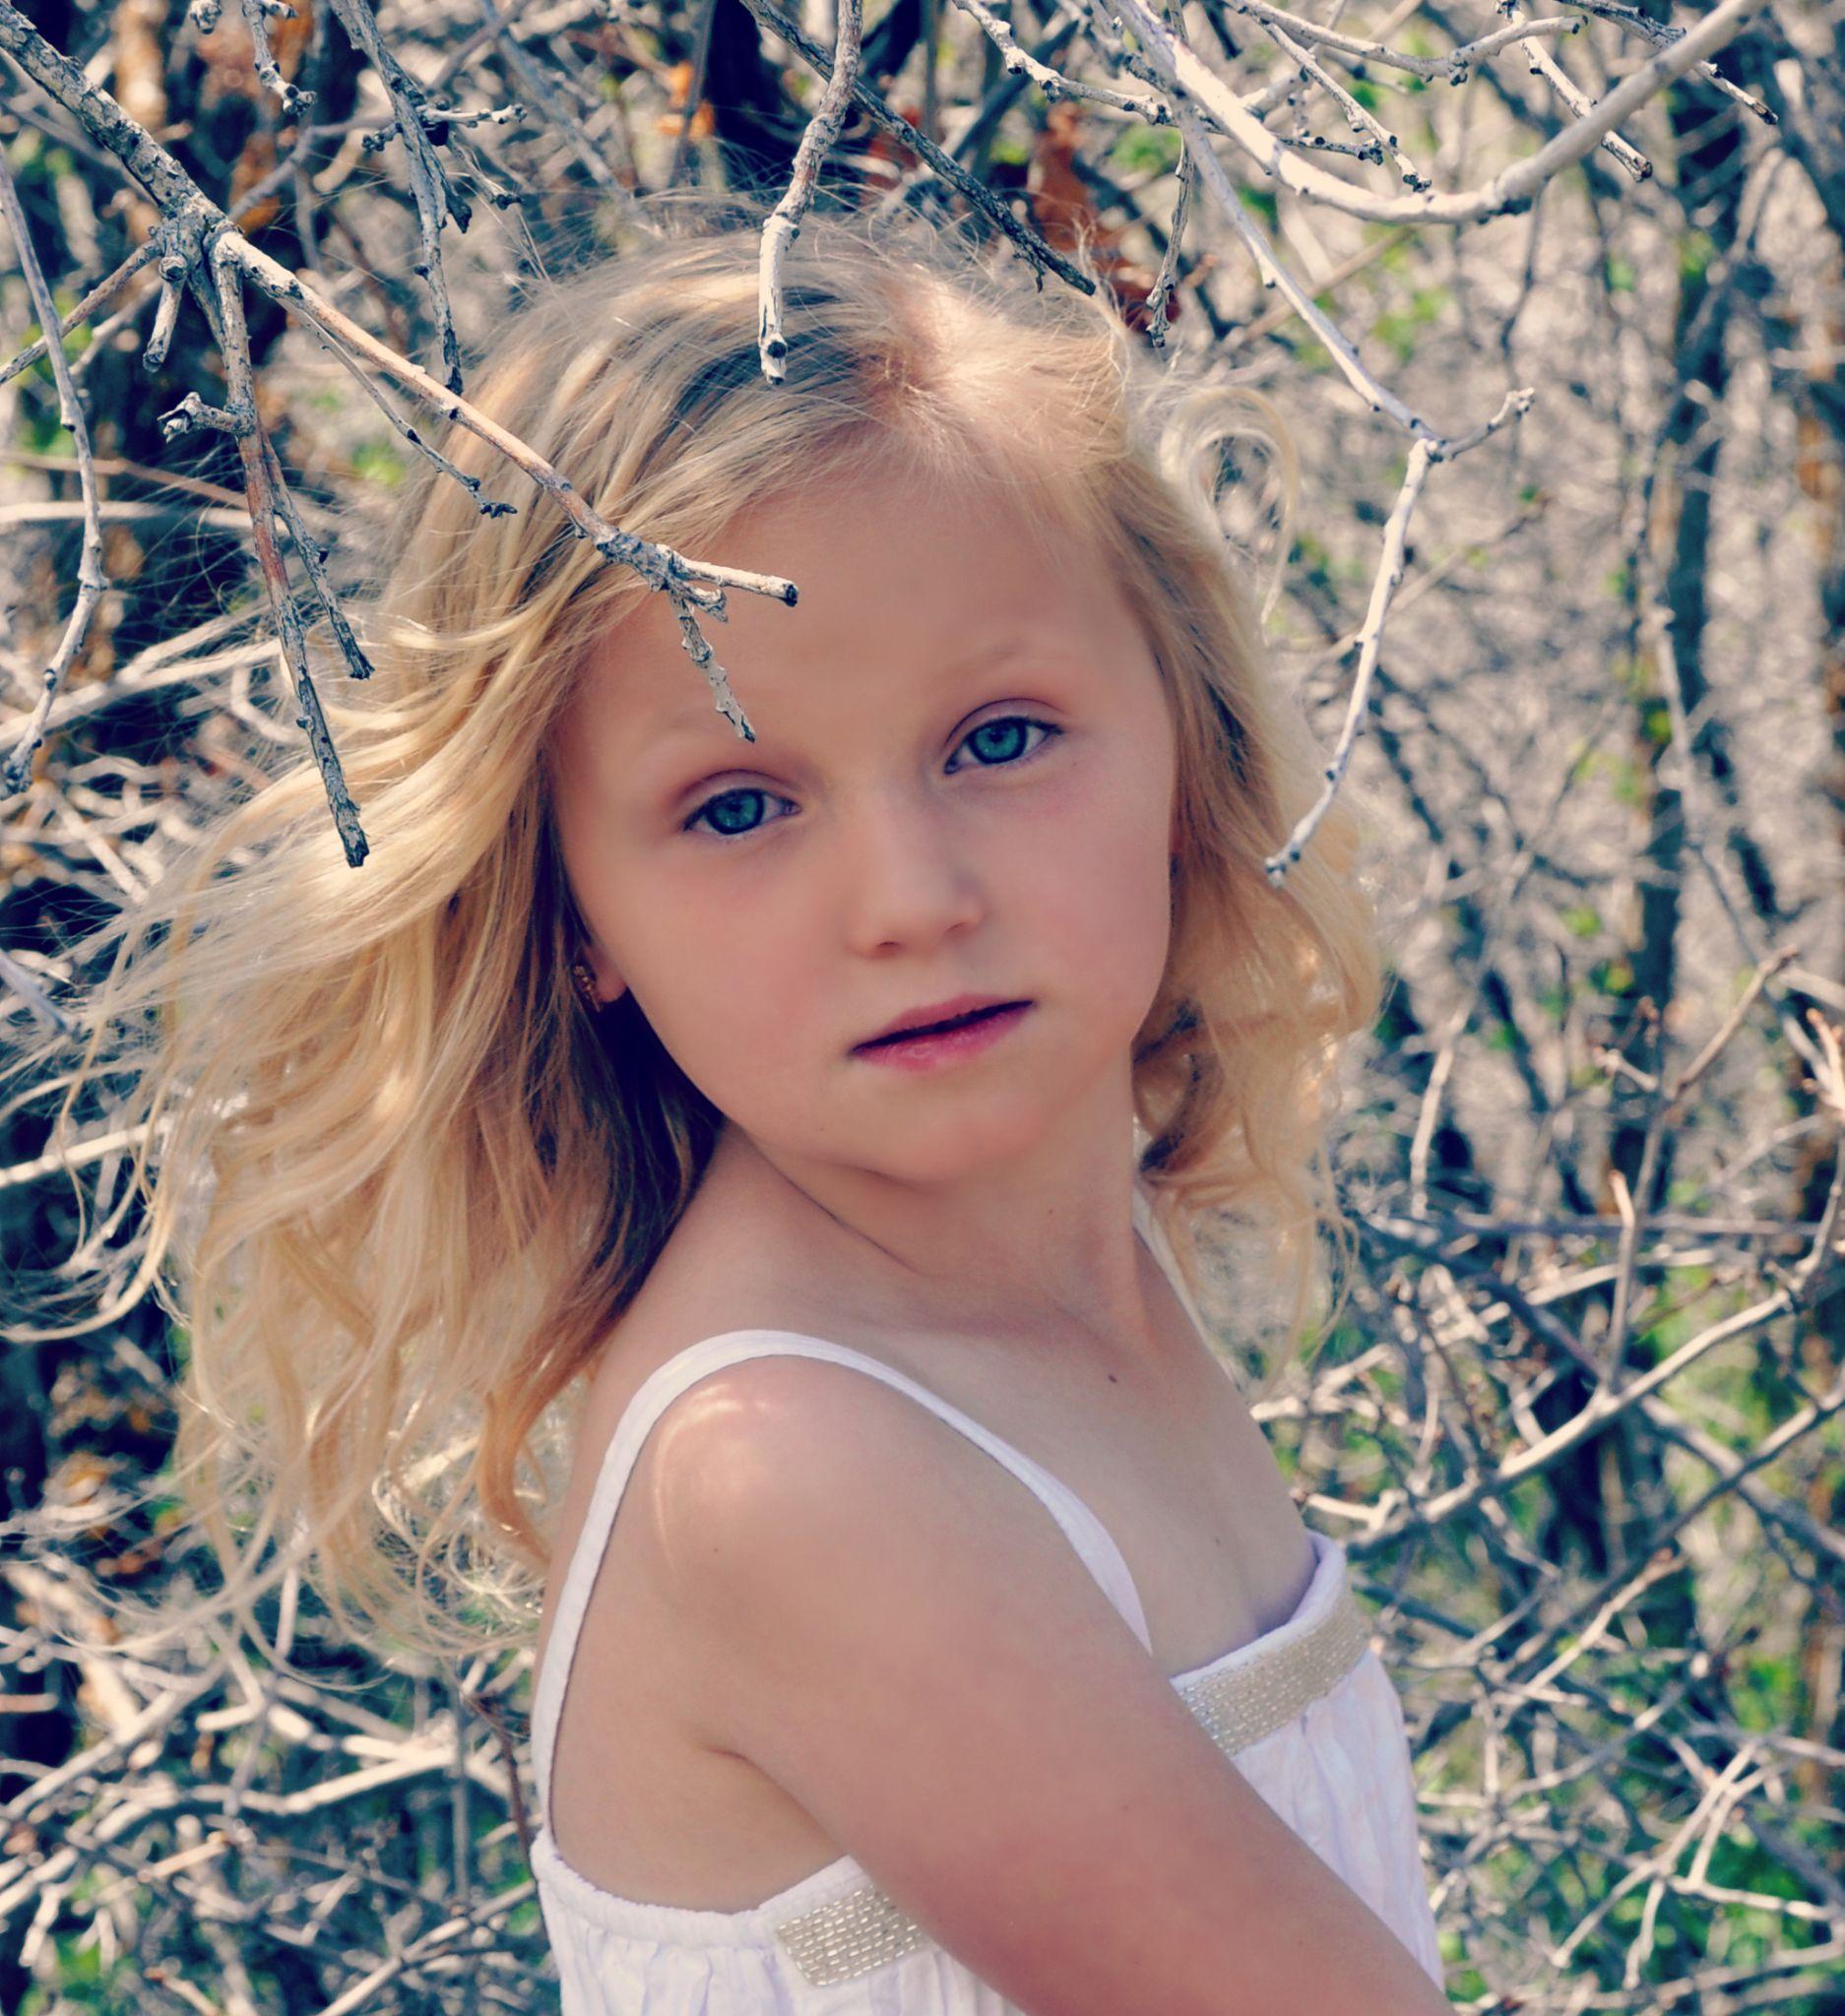 Faerie Princess by Sara Tiger